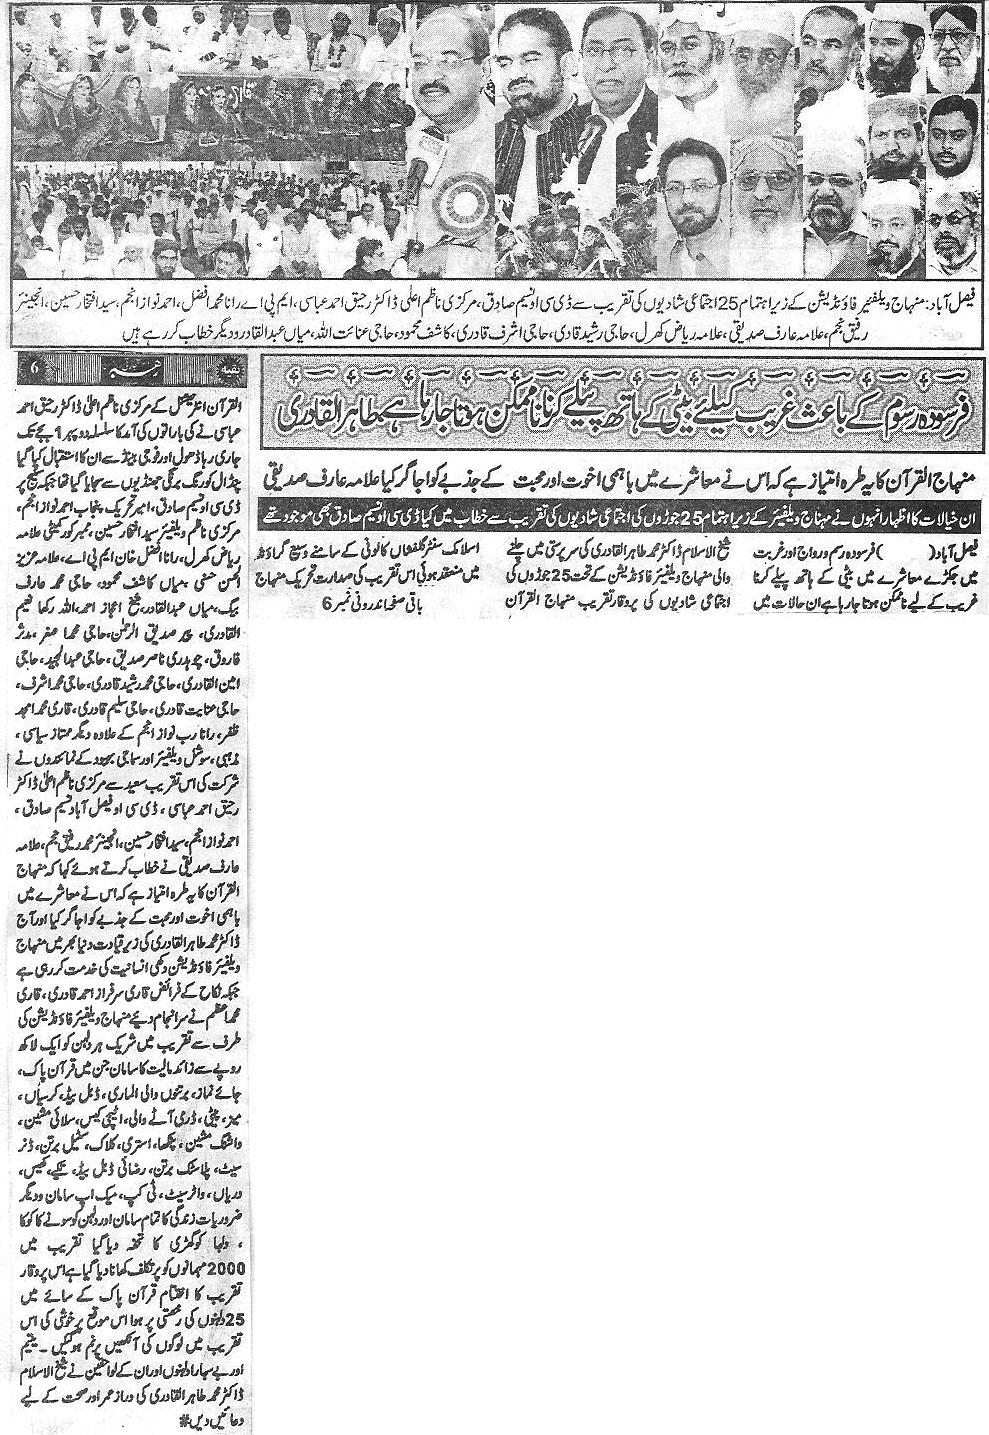 تحریک منہاج القرآن Minhaj-ul-Quran  Print Media Coverage پرنٹ میڈیا کوریج Daily Tjart-e-Rahber